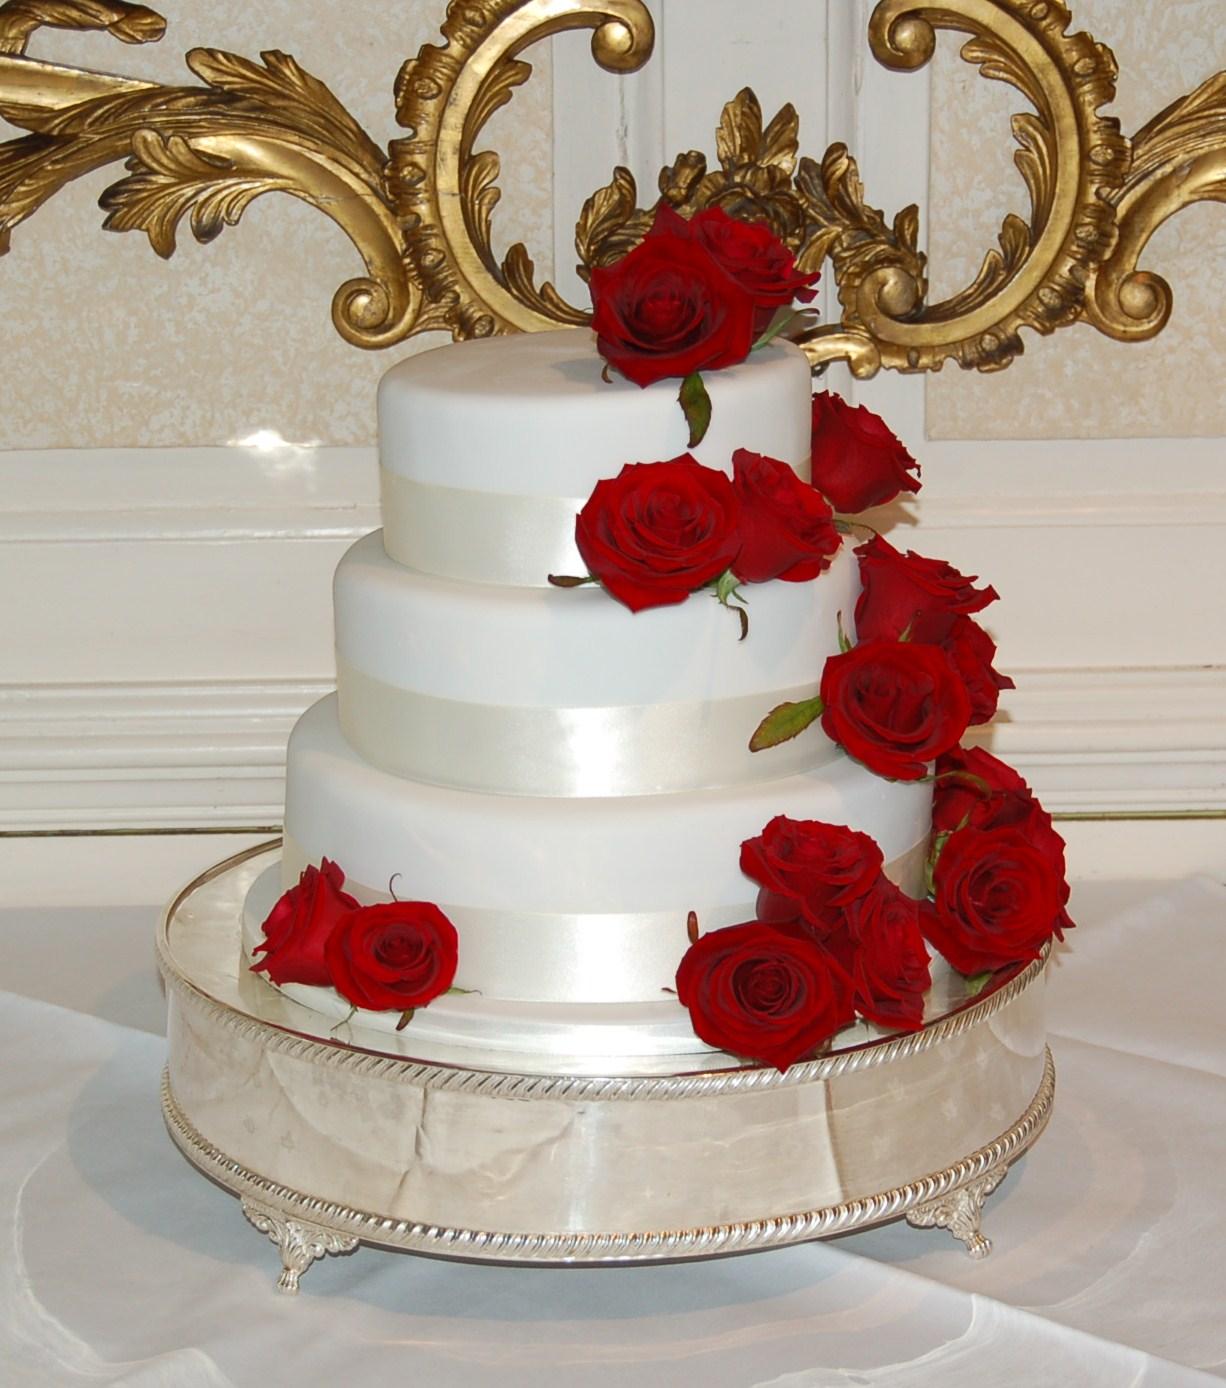 Brighton Baker Cake Gallery